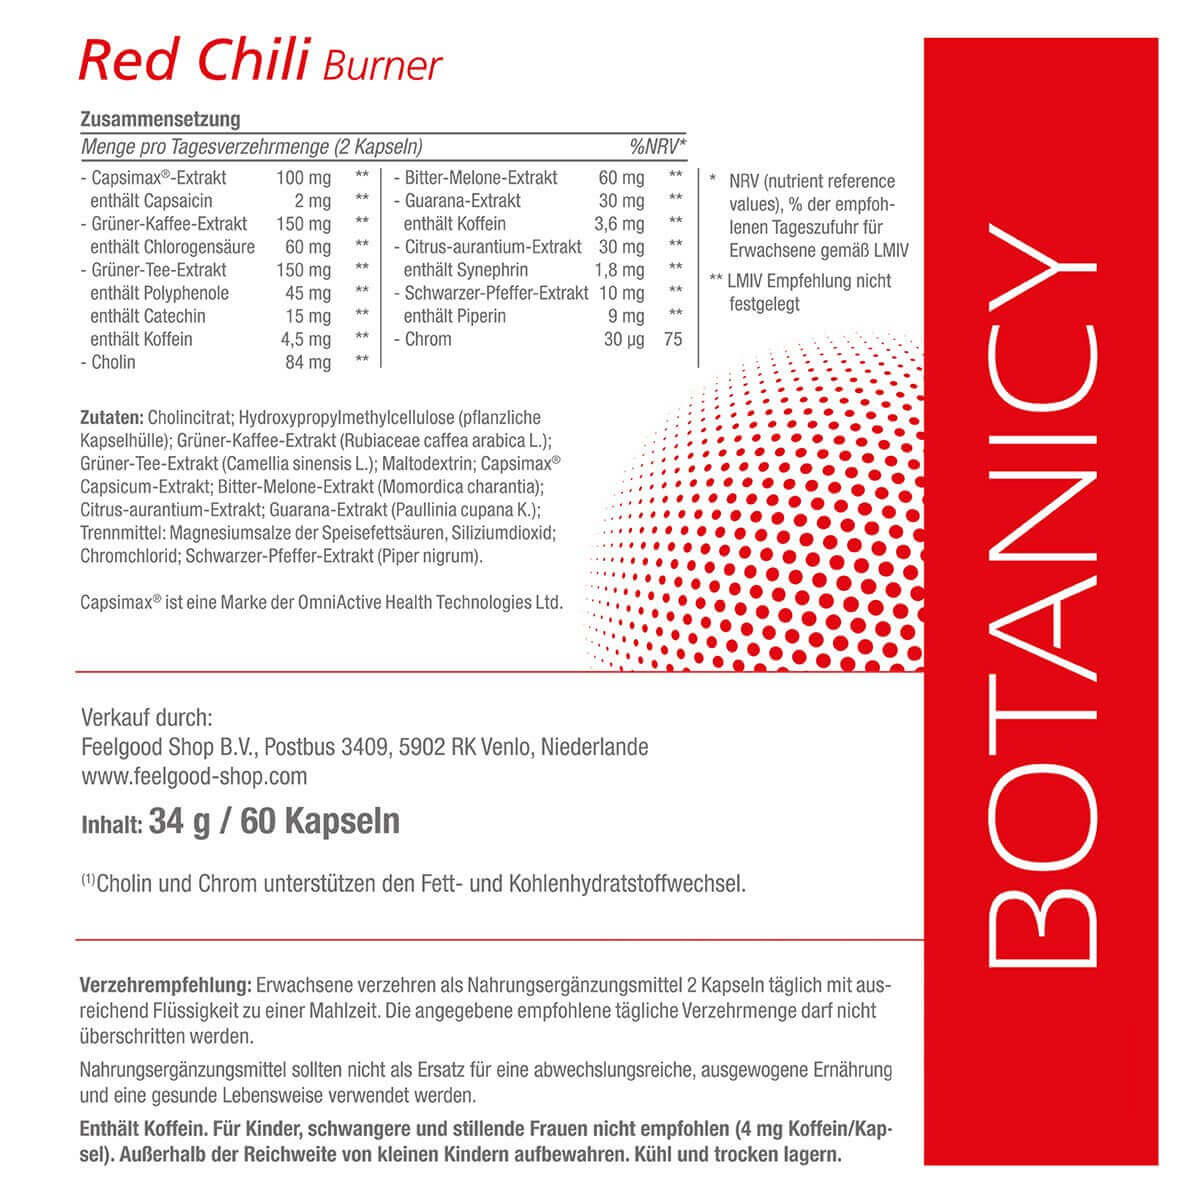 RED CHILI BURNER mit Capsimax